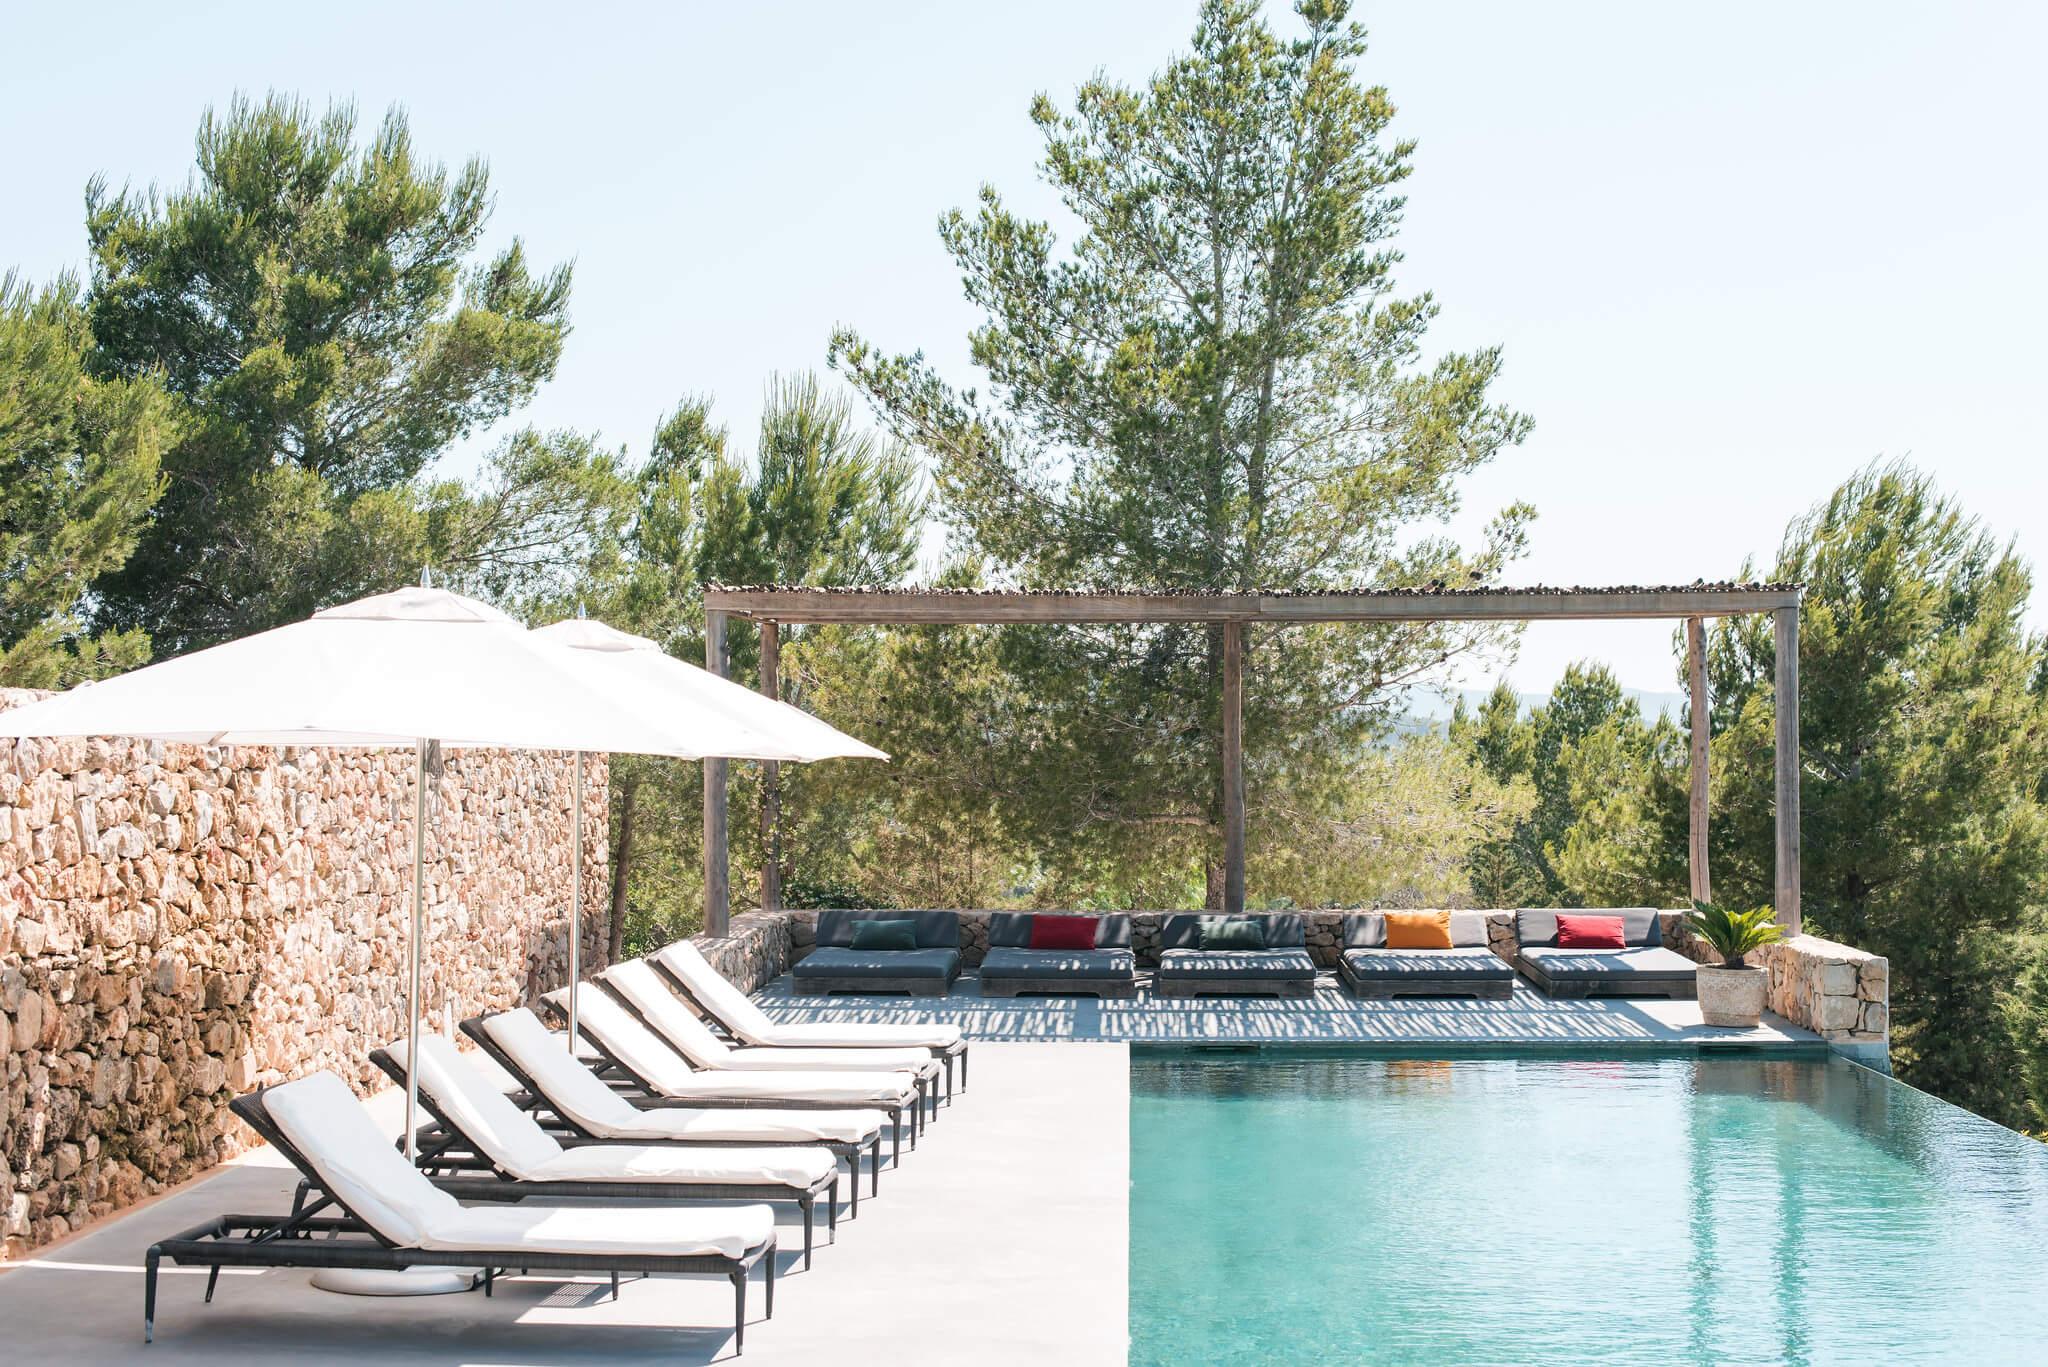 https://www.white-ibiza.com/wp-content/uploads/2020/05/white-ibiza-villas-can-zama-pool-loungers-copy.jpg